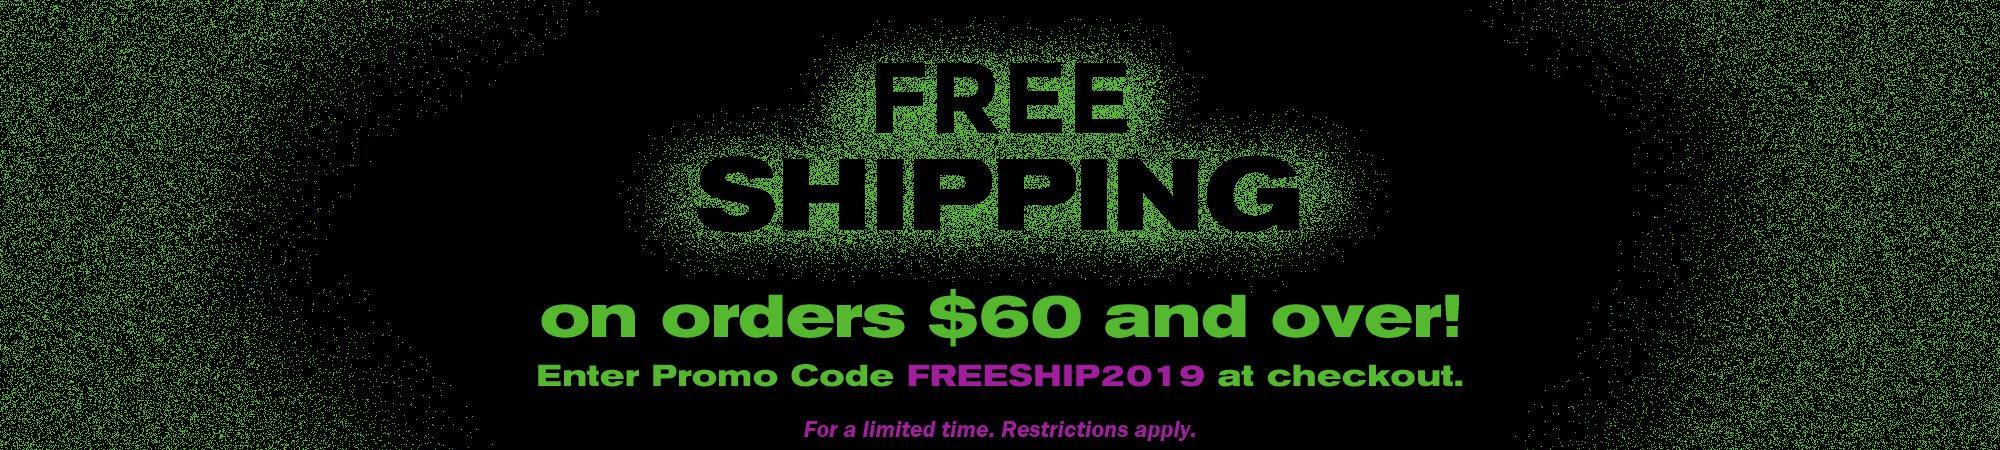 SockGuy_Free_Shipping3